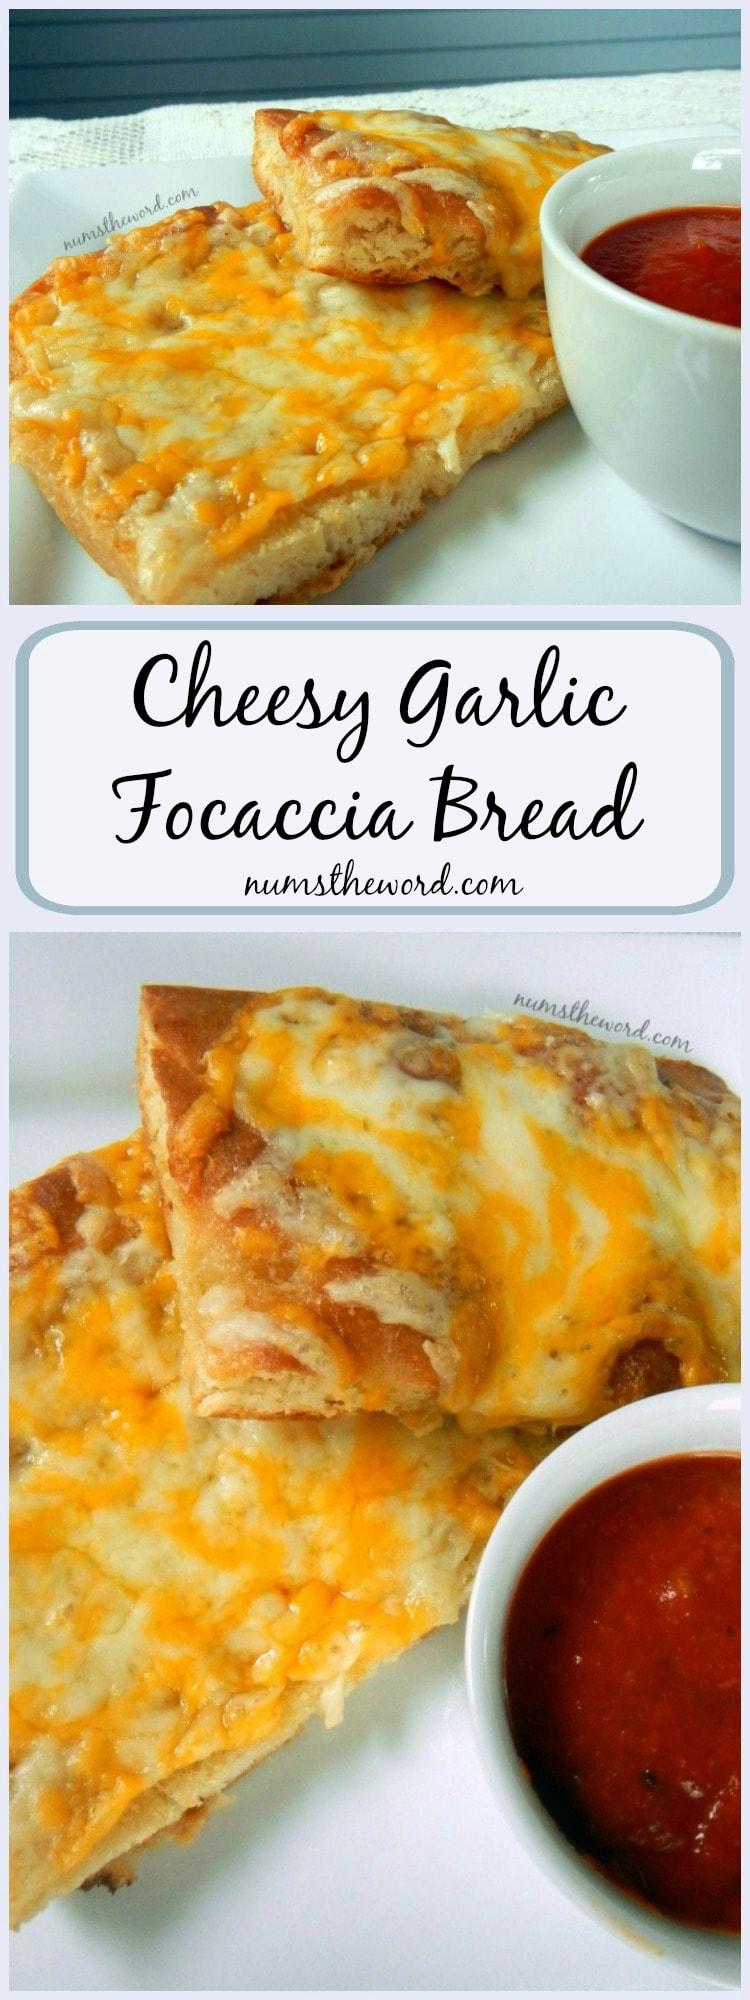 Cheesy Garlic Focaccia Bread LONG